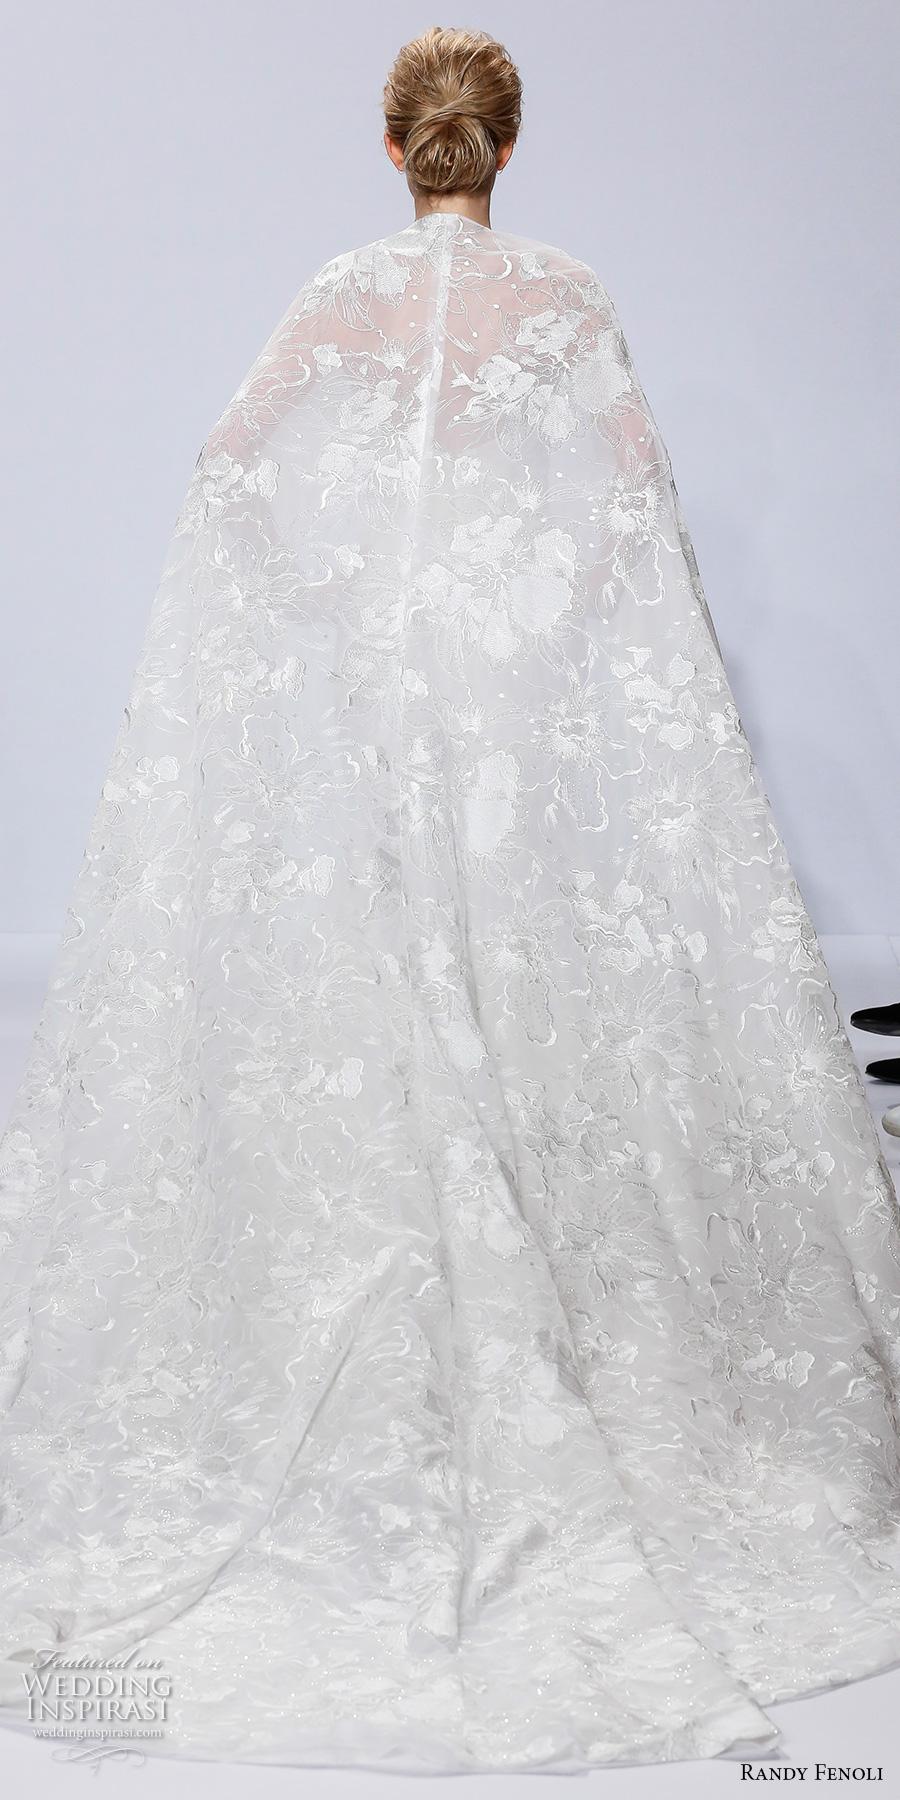 randy fenoli spring 2018 bridal strapless semi sweetheart neckline full embellished bodice elegant mermaid wedding dress full cape (16) bv